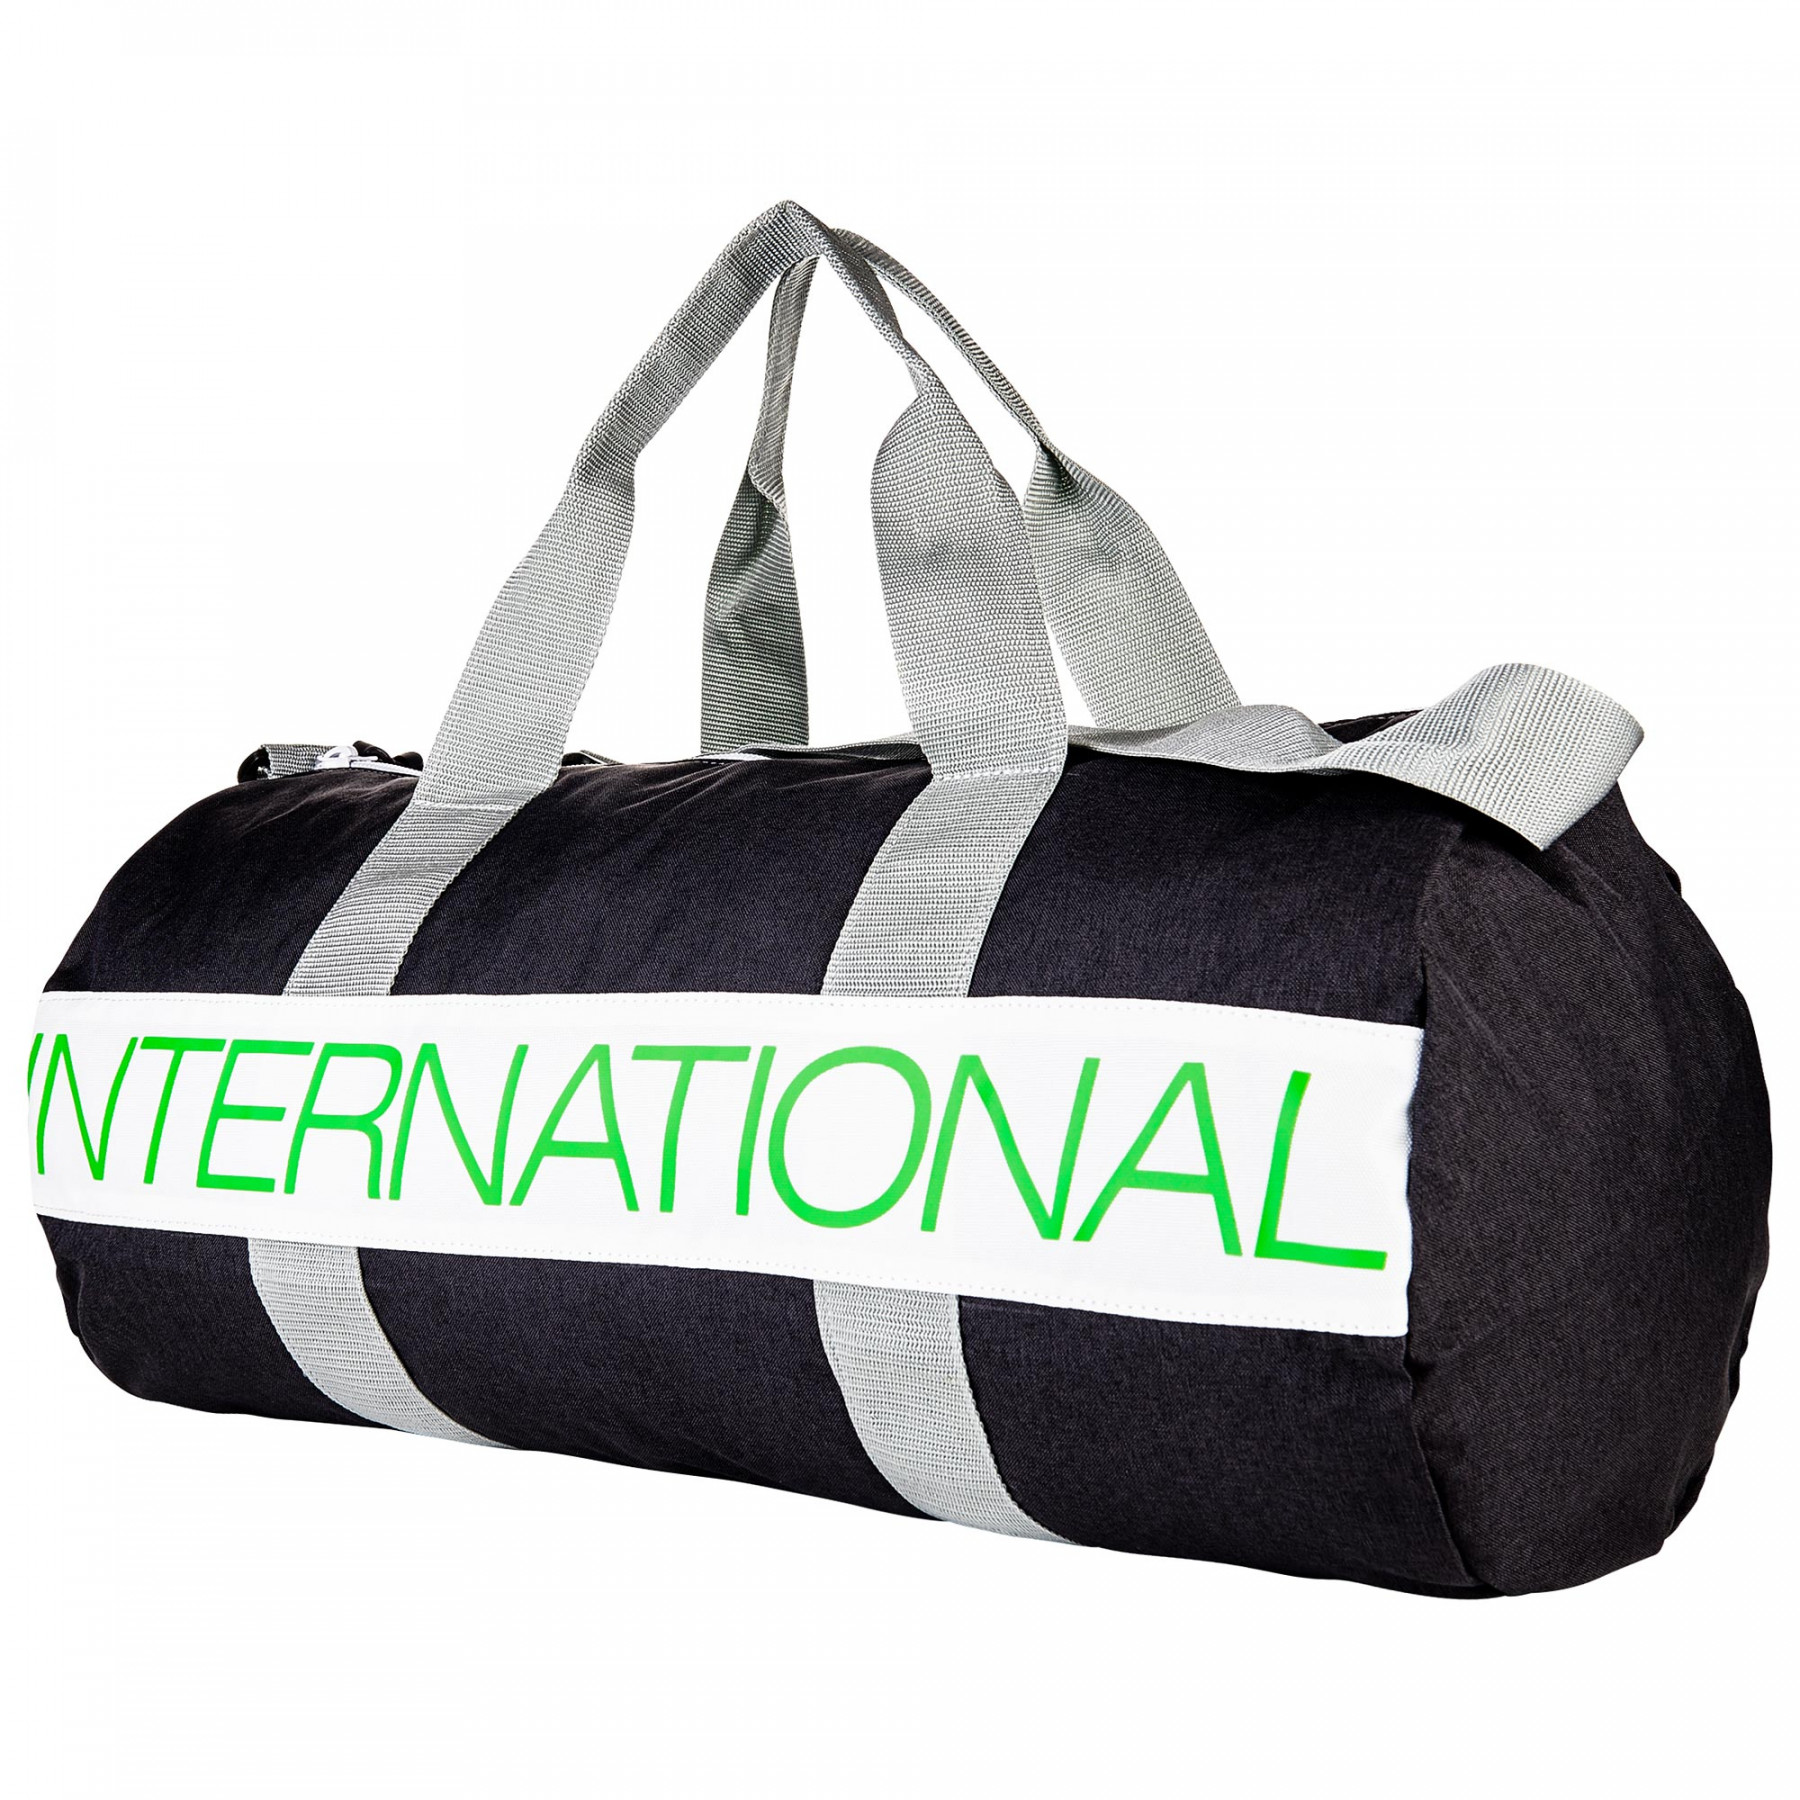 international sac de sport homme superdry gris pas cher. Black Bedroom Furniture Sets. Home Design Ideas